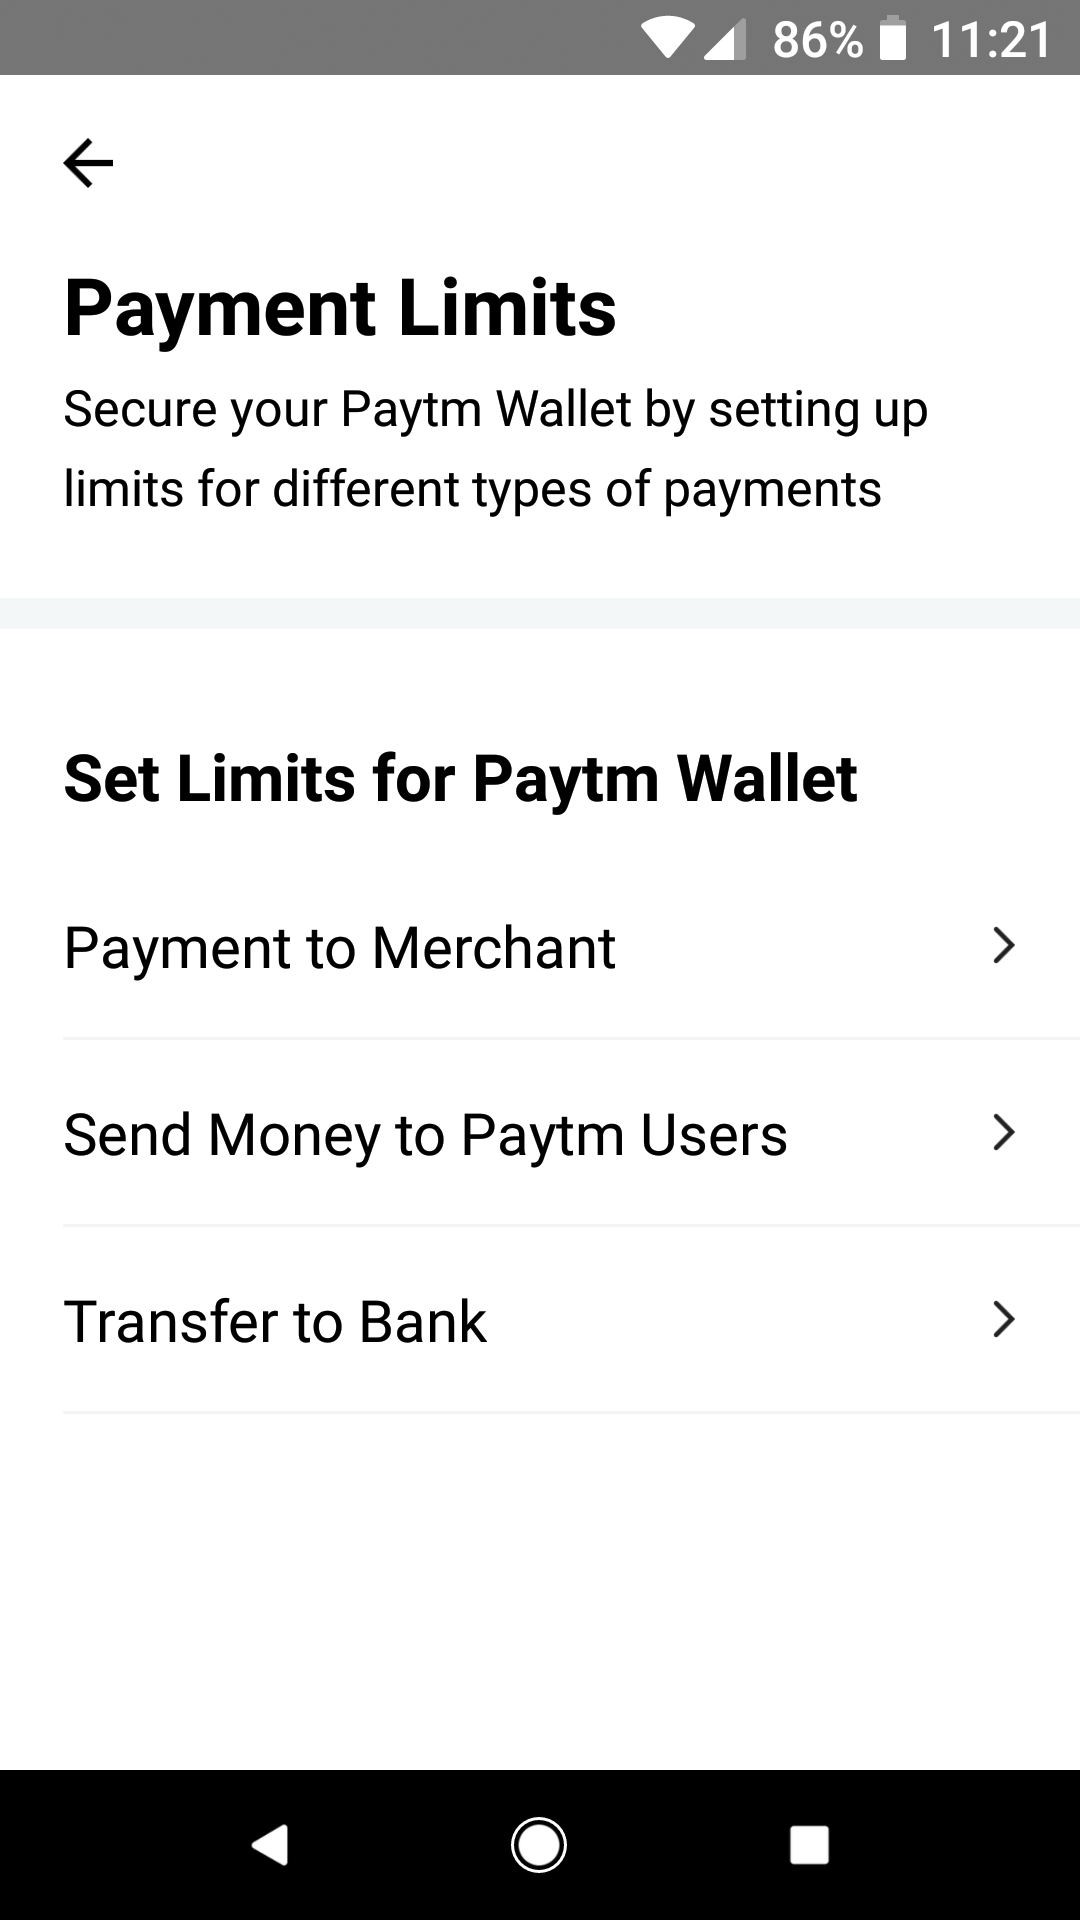 PayTM - Payment Limits